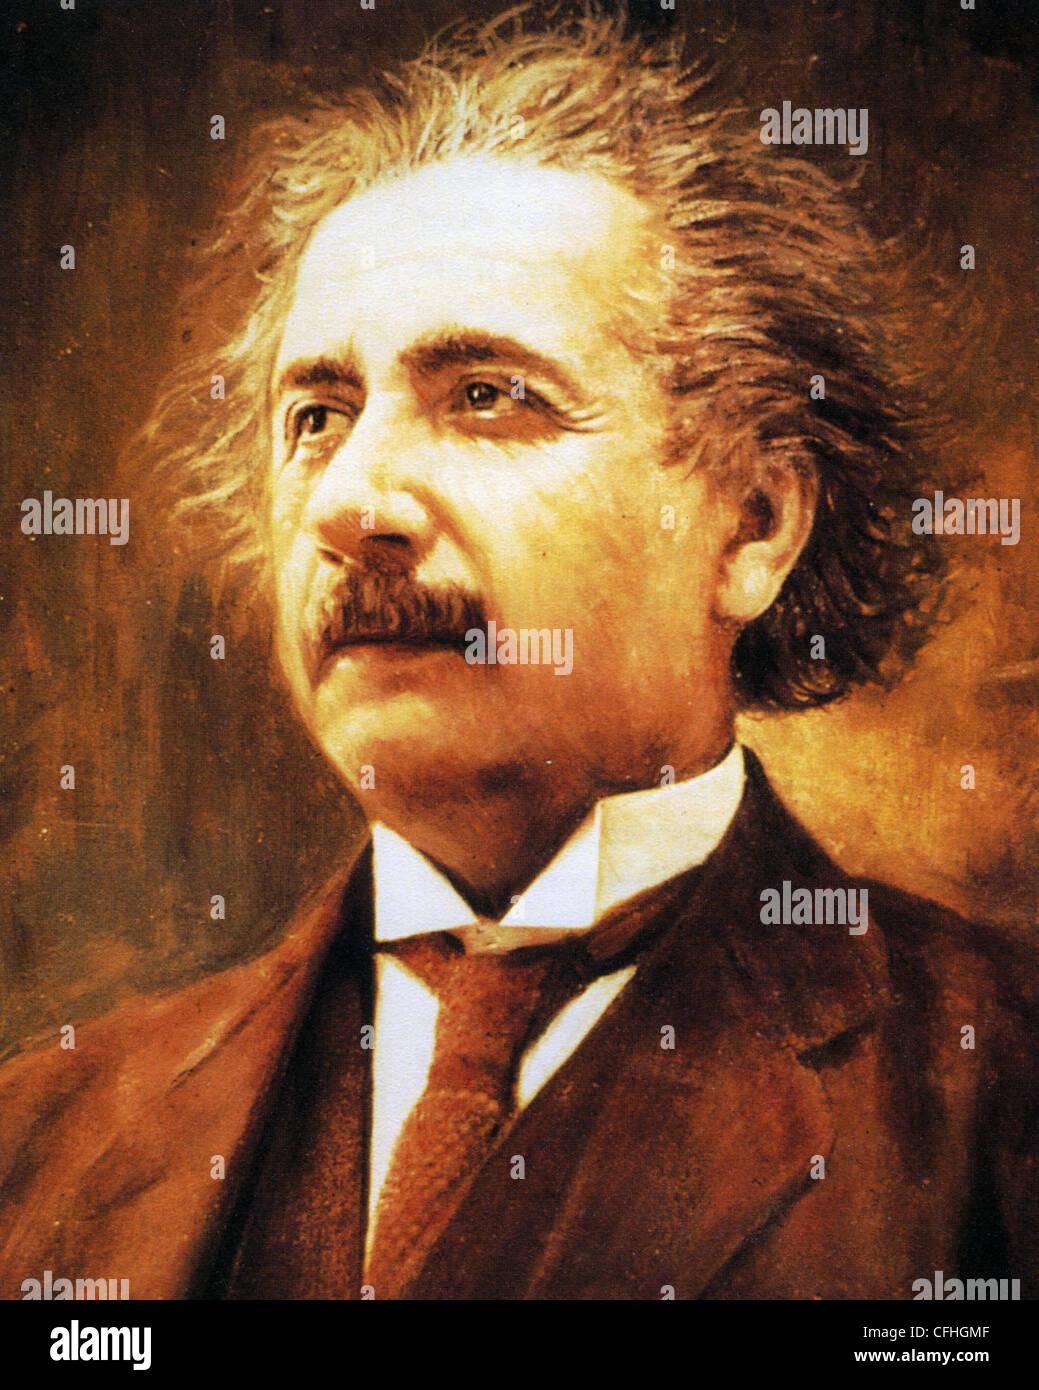 ALBERT EINSTEIN (1879-1955) tedesco-nato fisico teorico Immagini Stock